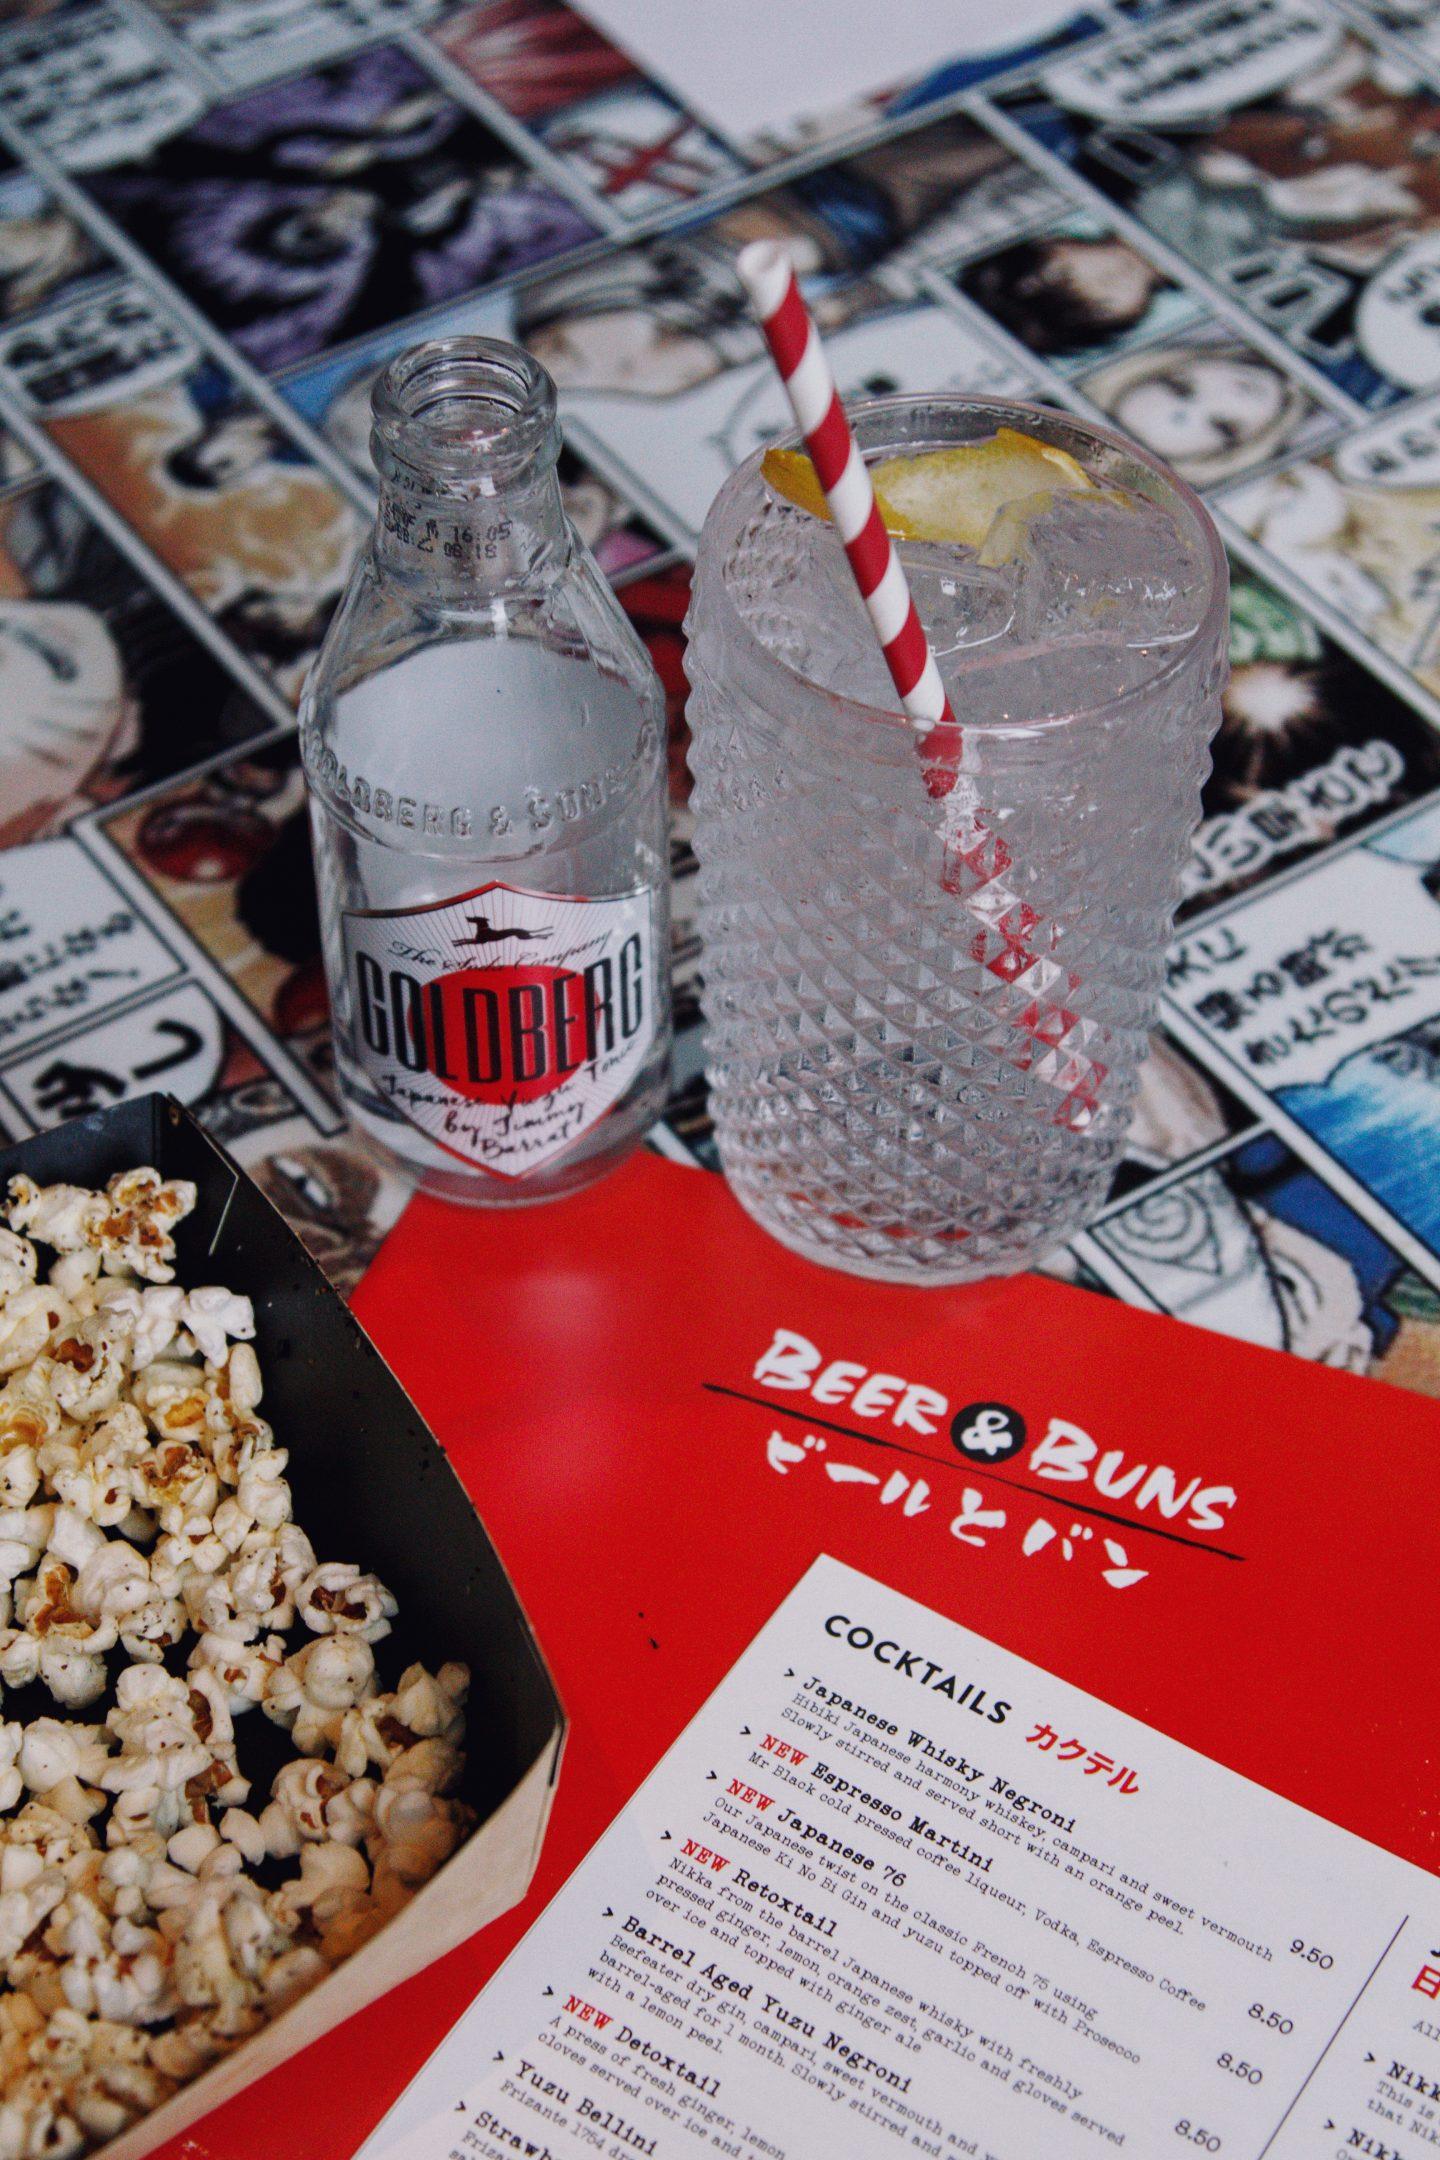 Beer & Buns New Menu - London Restaurant Review